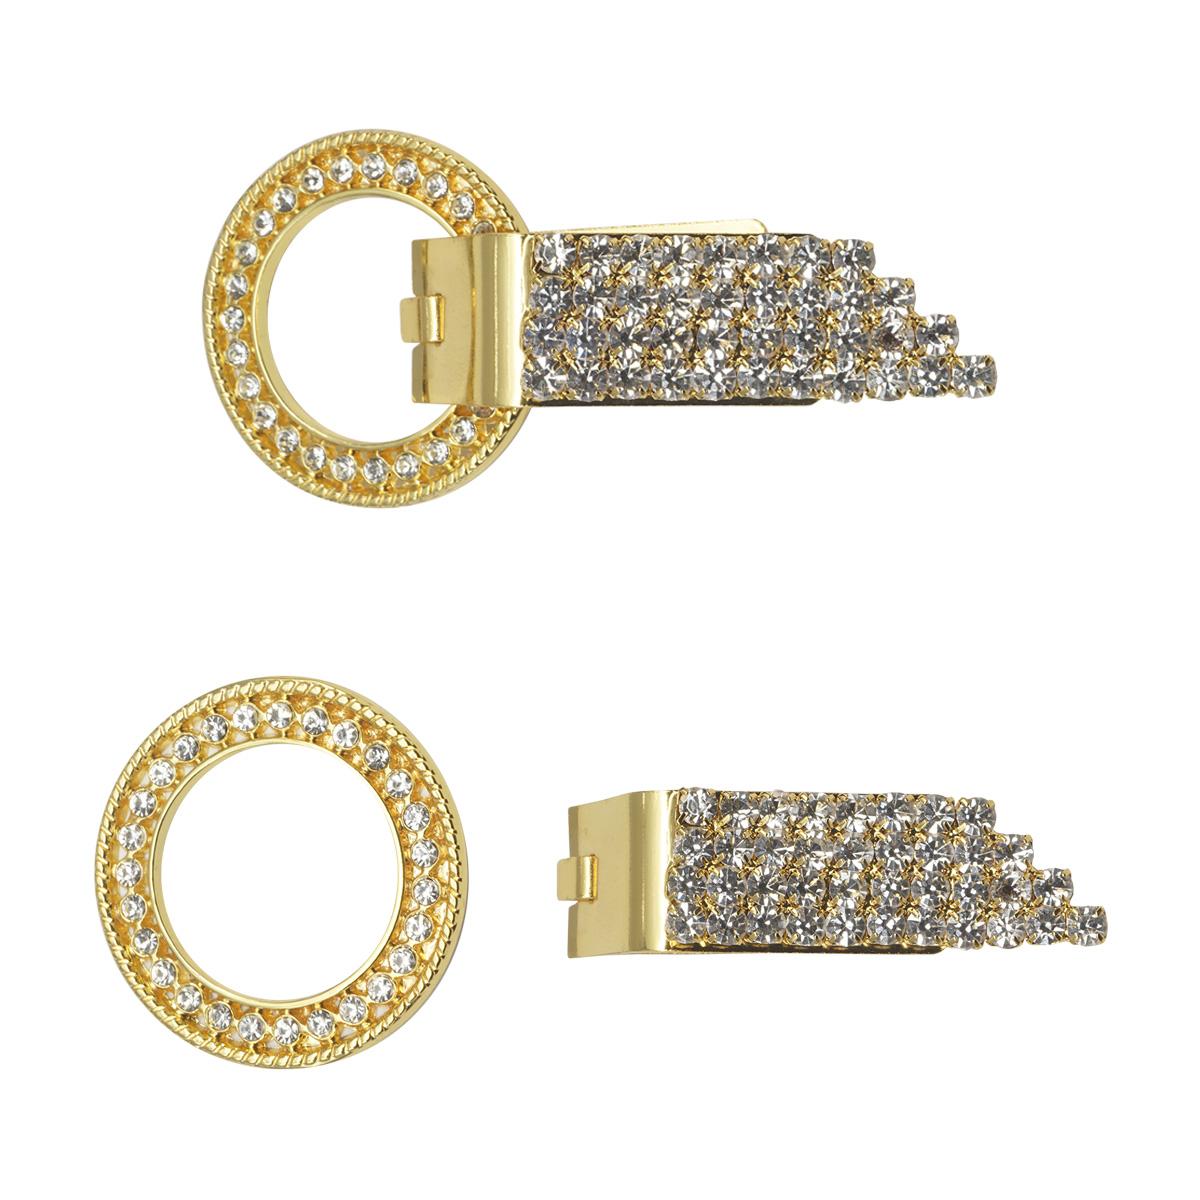 AB5278 Крючок шубный со стразами, Cristal (золото)